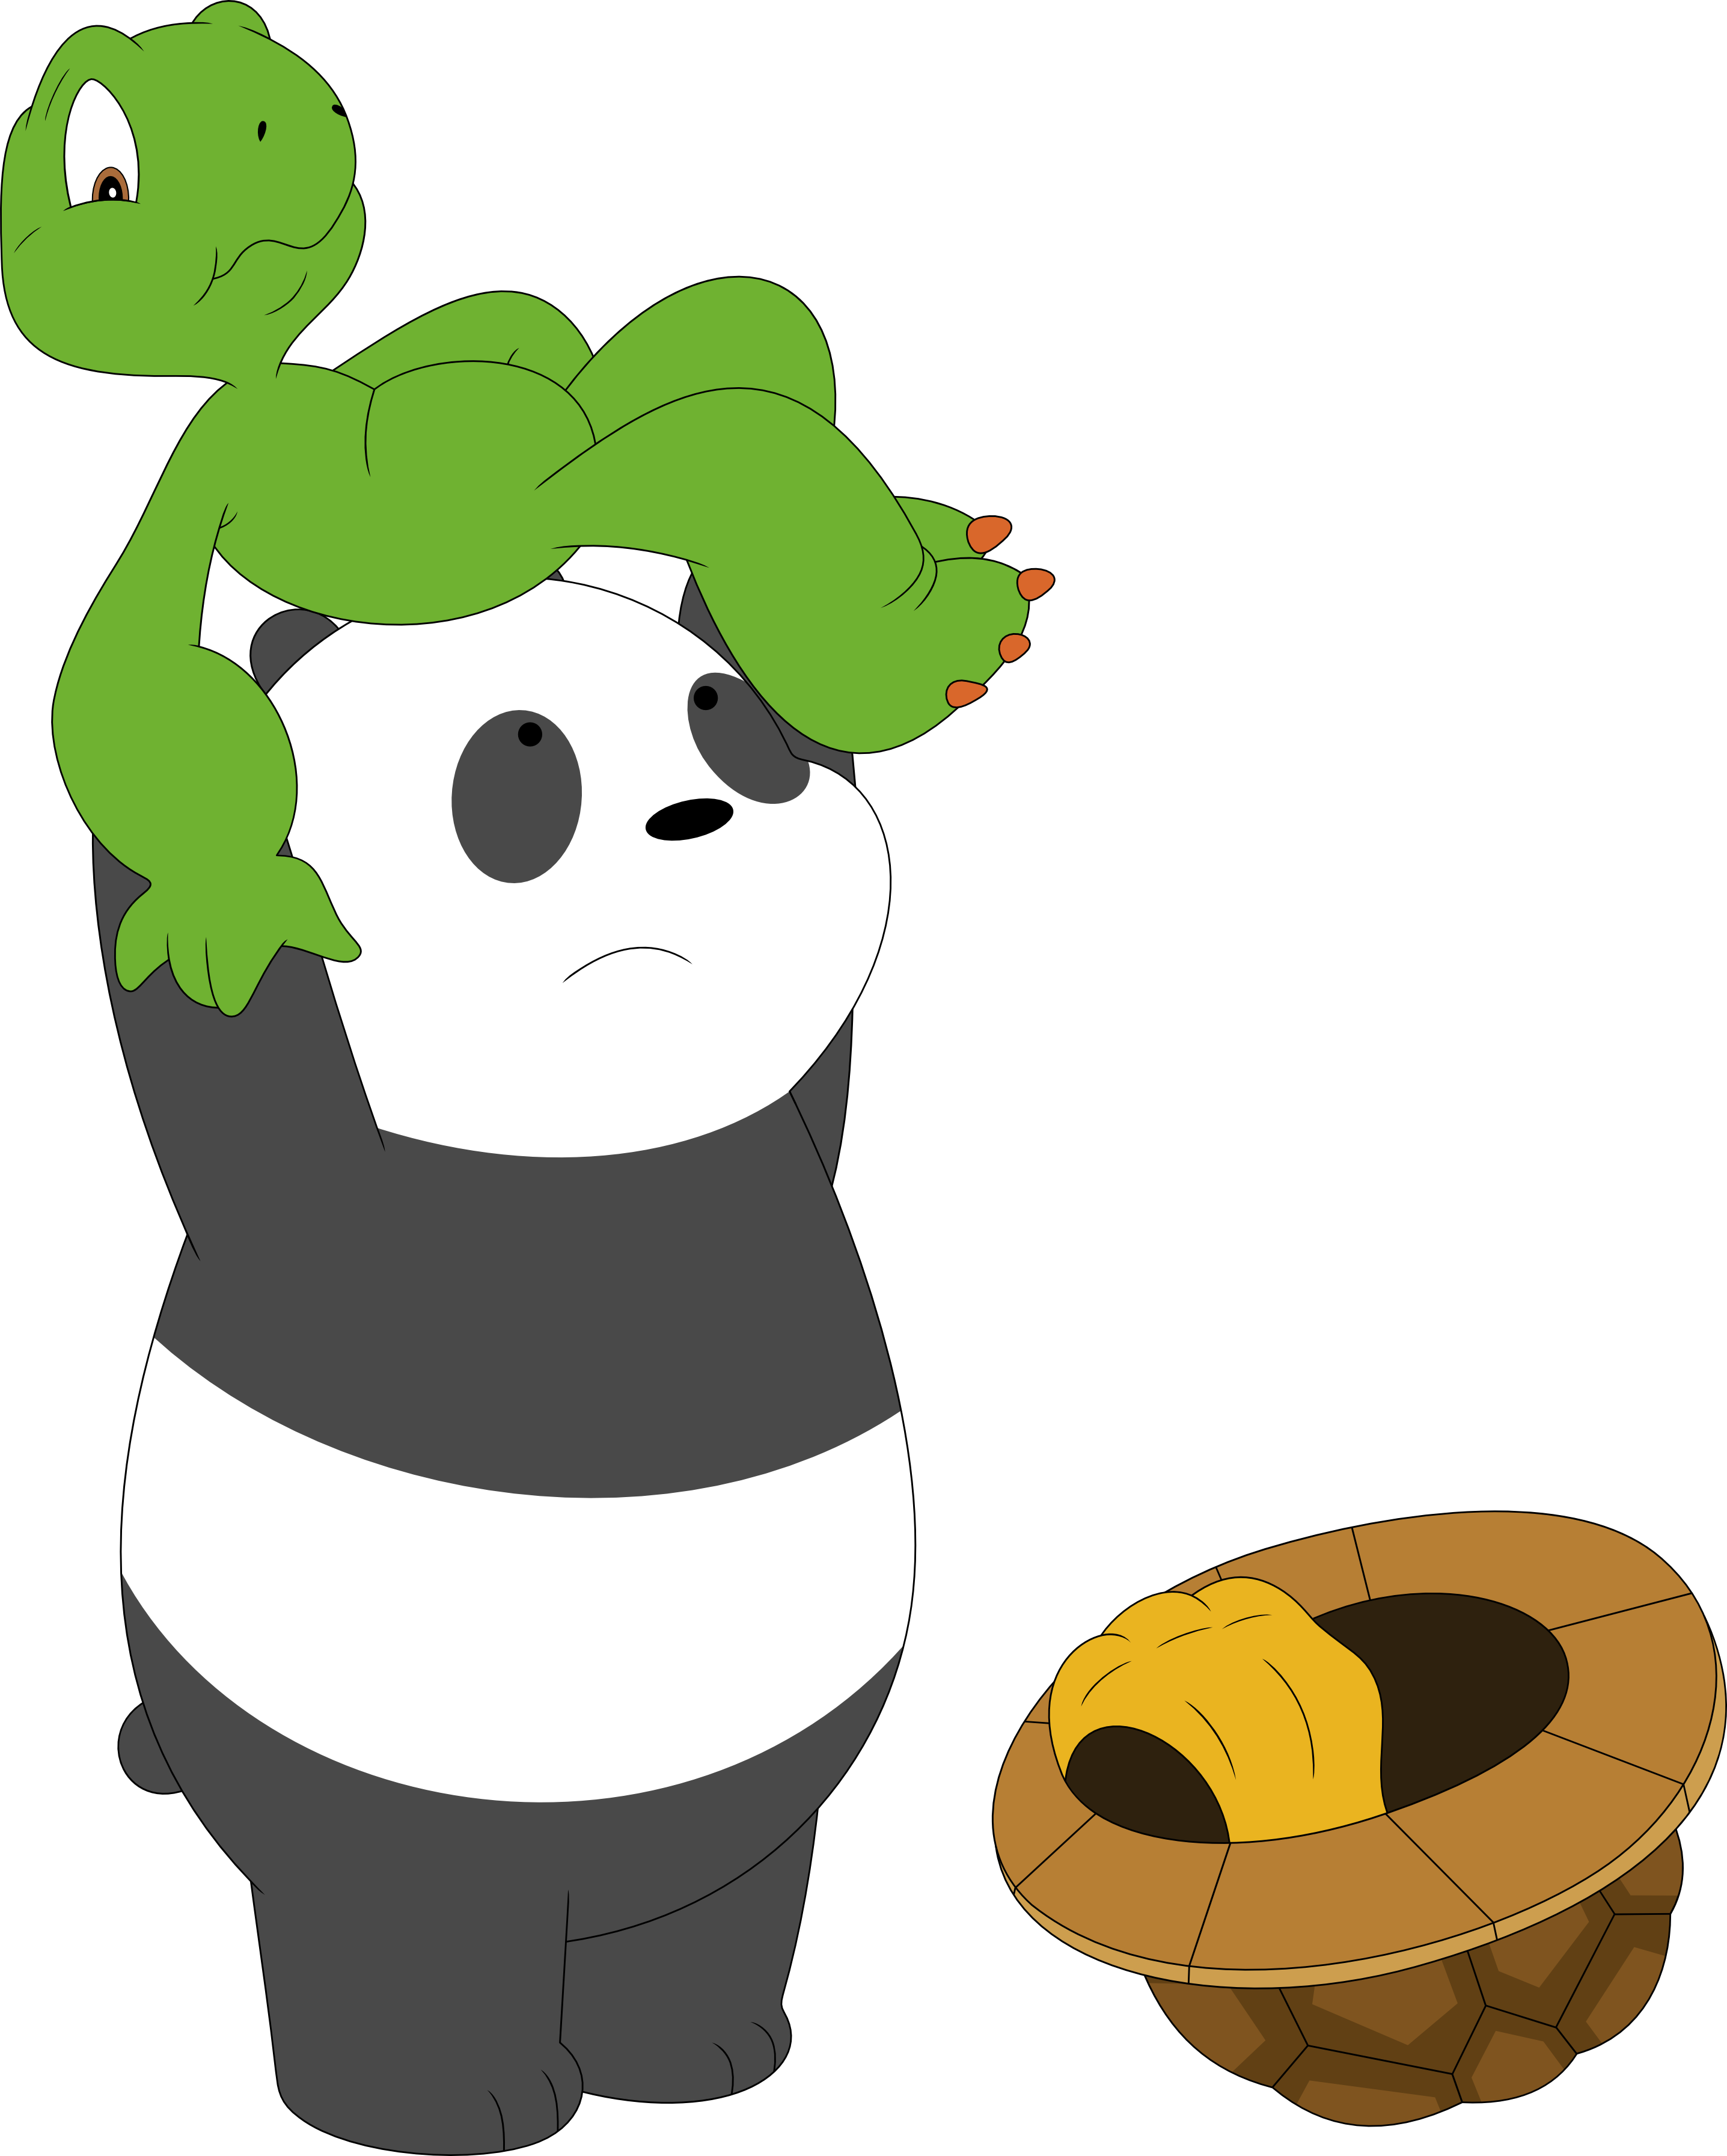 Uncategorized Cartoon Franklin panda de shells franklin by porygon2z on deviantart porygon2z